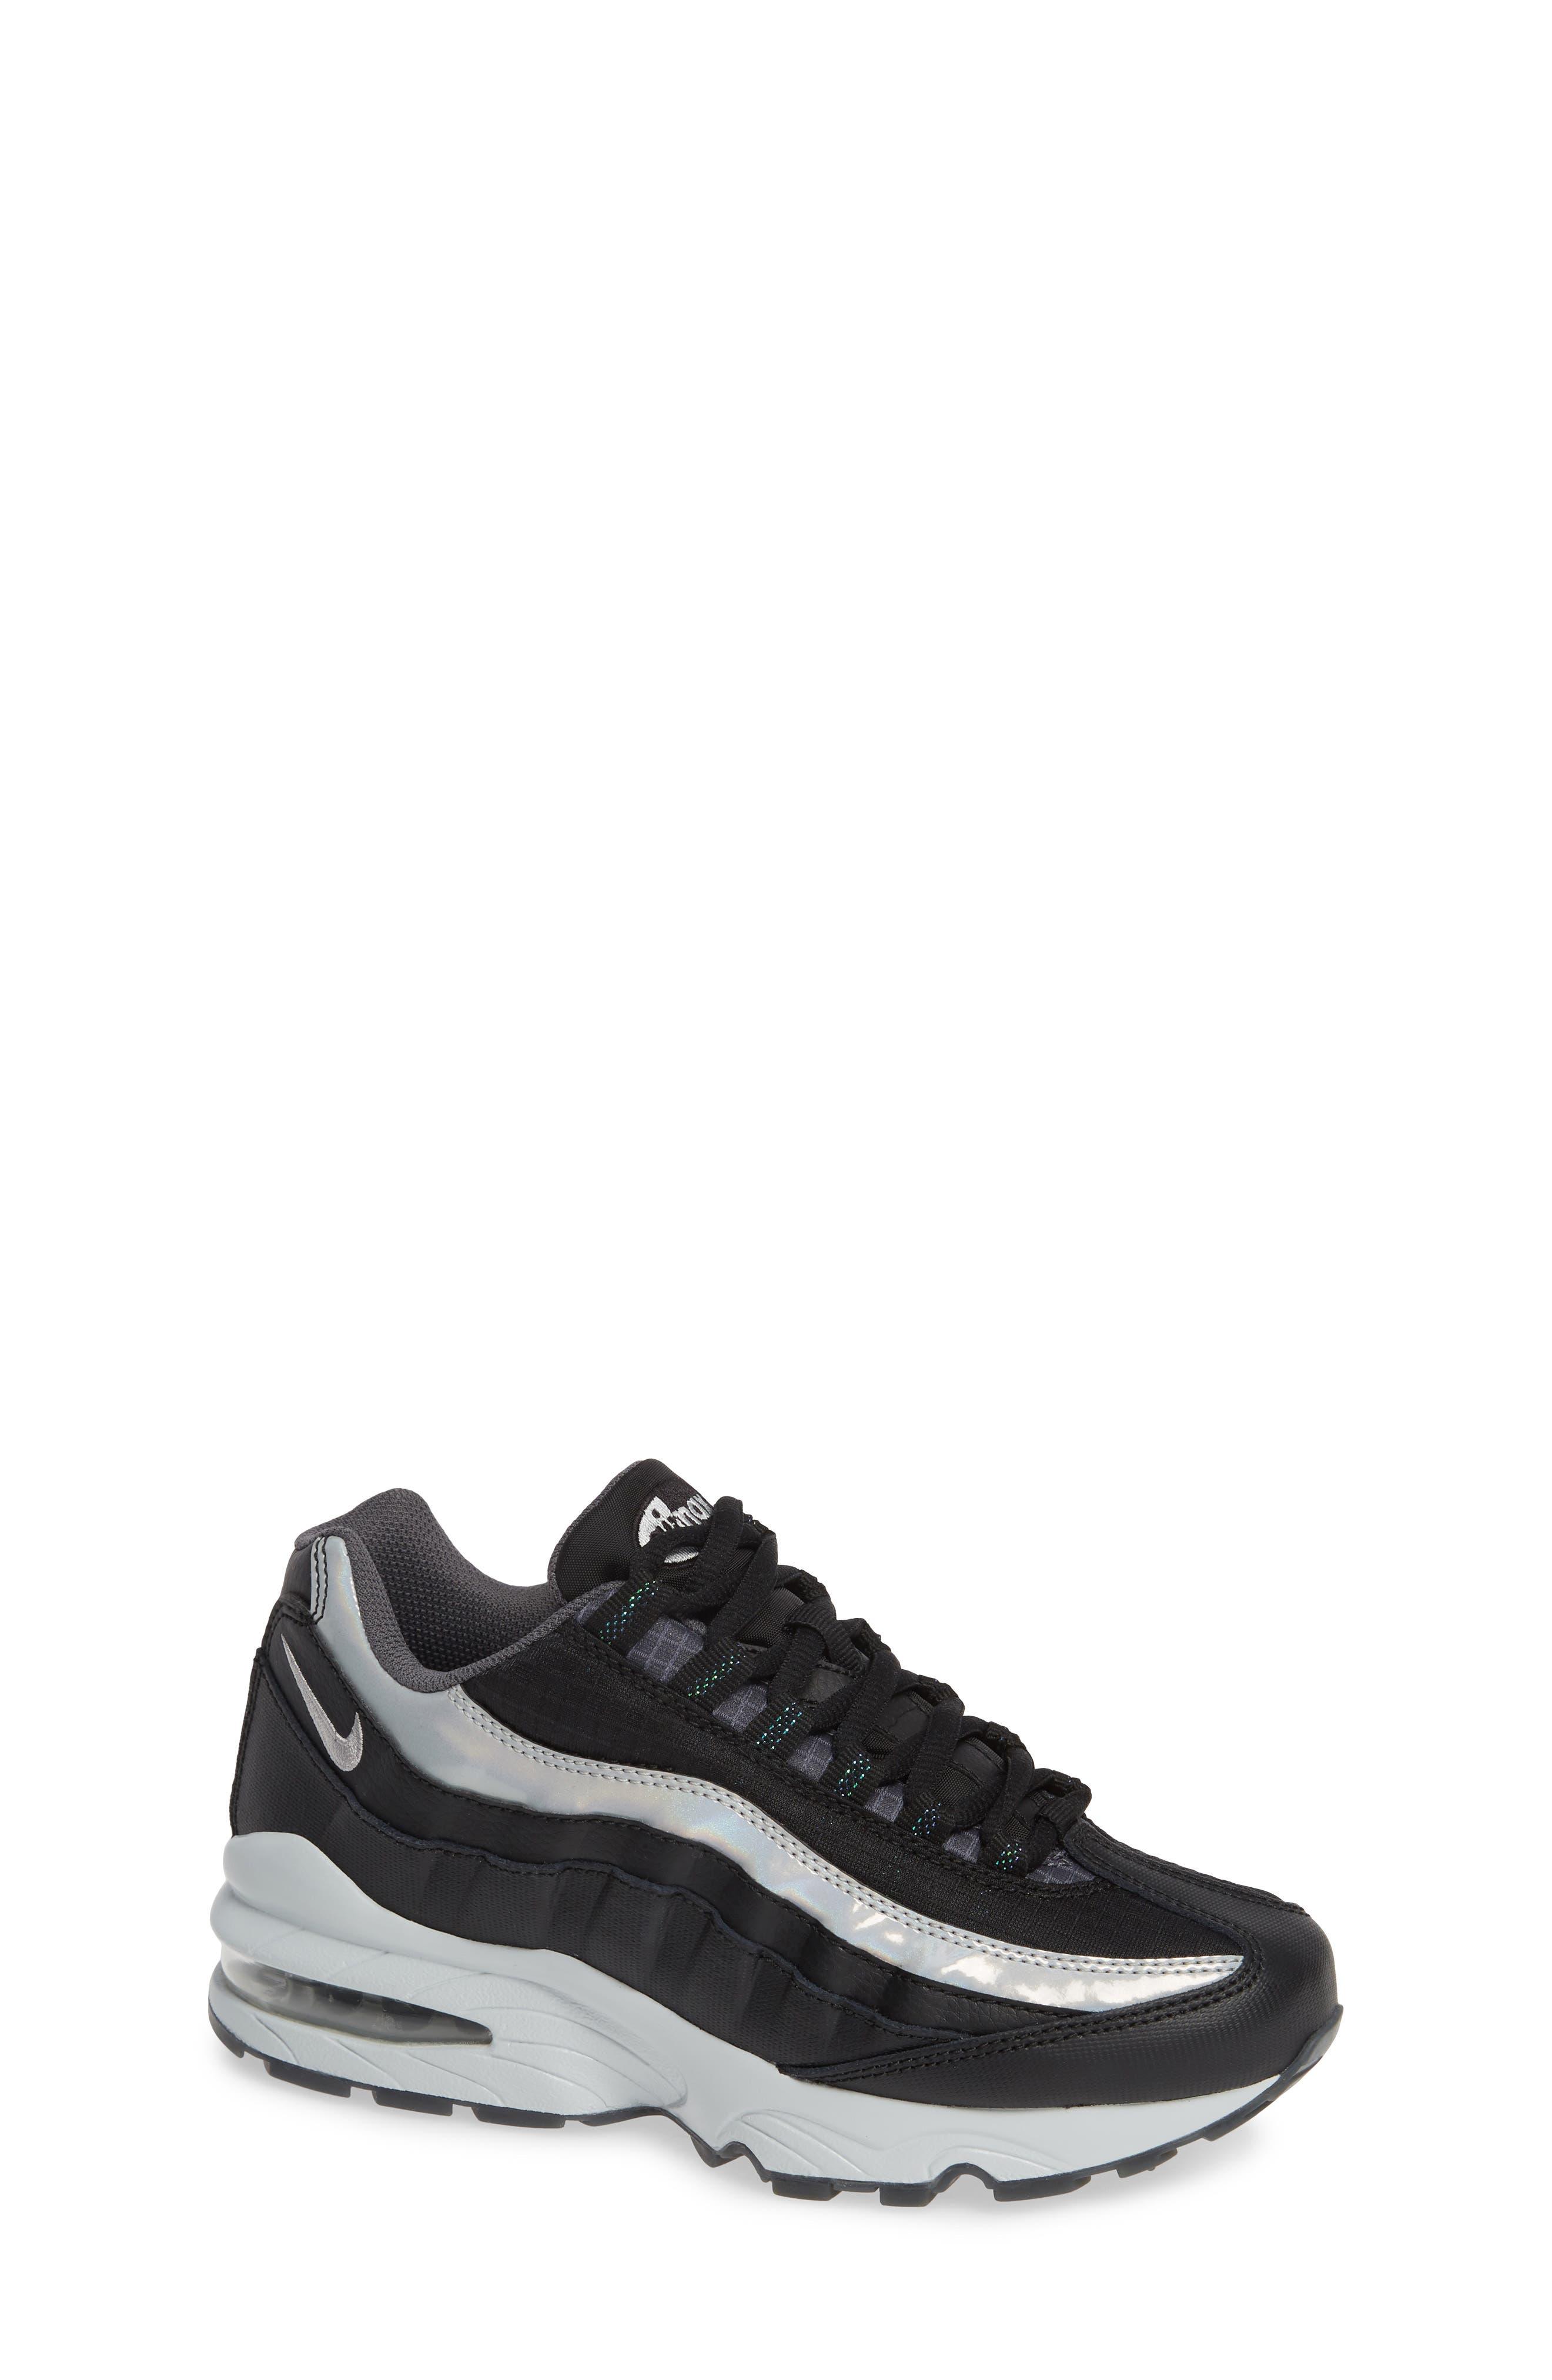 Air Max 95 Y2K Sneaker,                             Main thumbnail 1, color,                             BLACK METALLIC SILVER